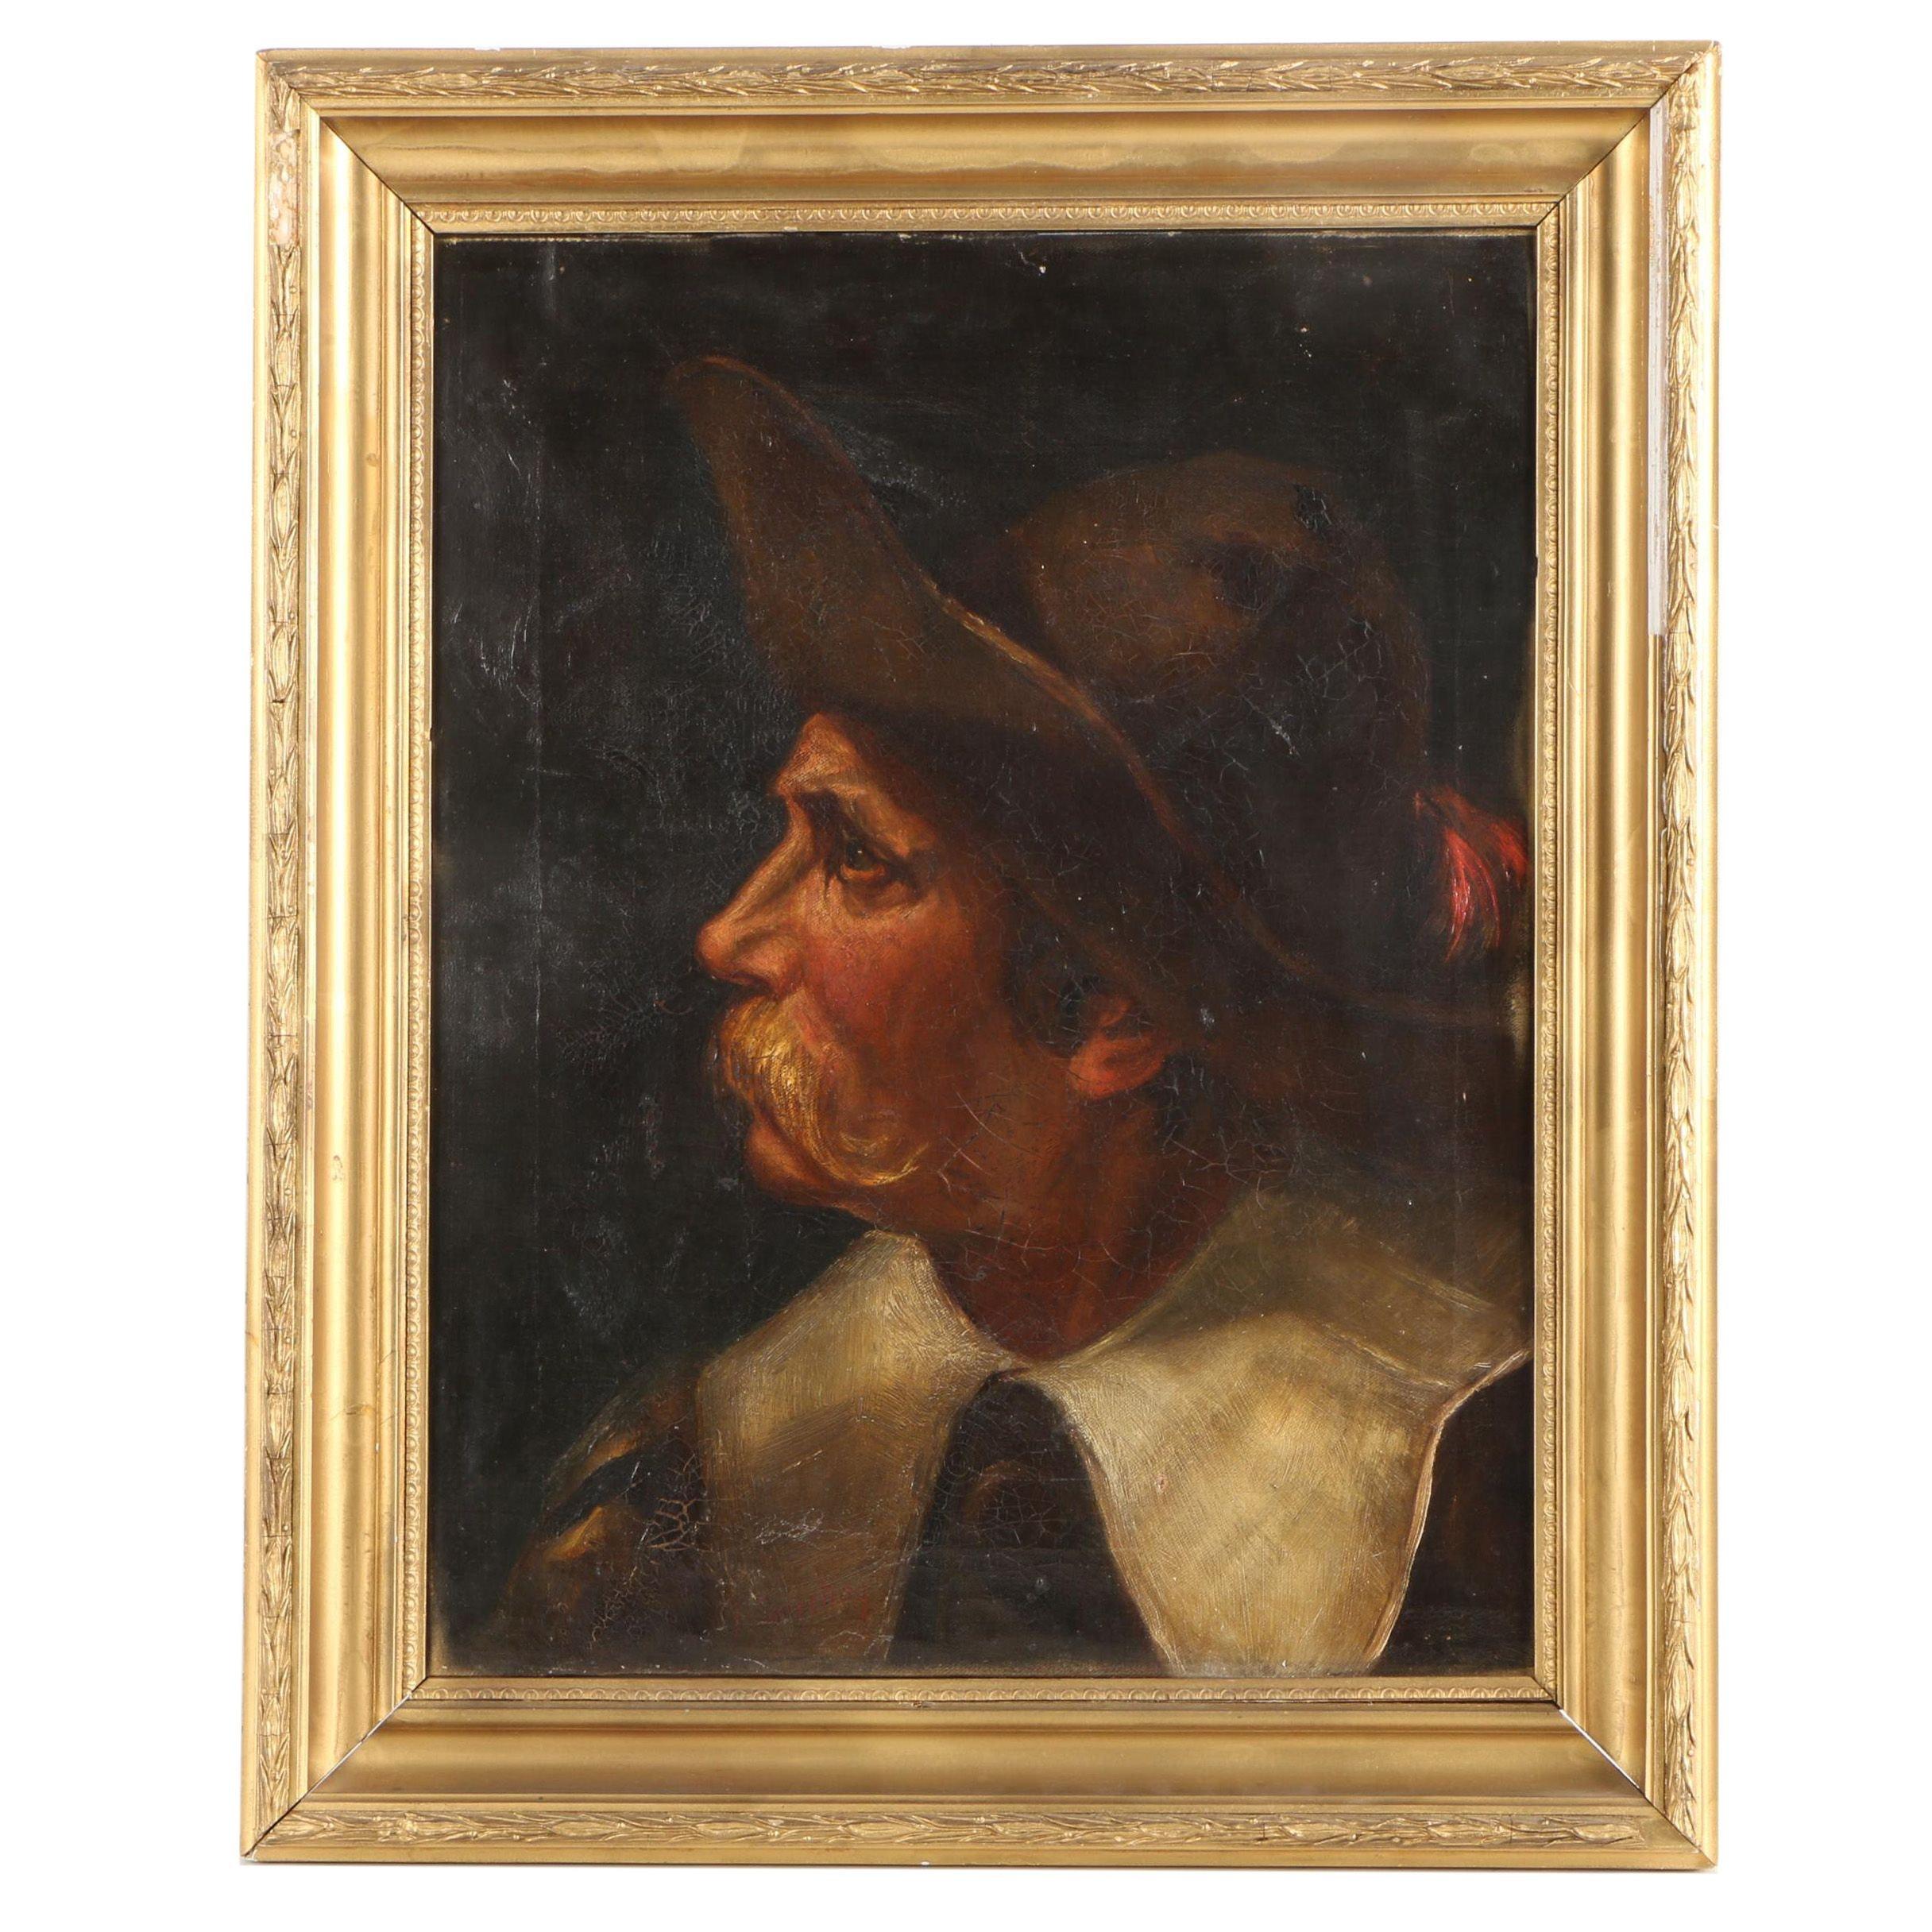 Oil Portrait on Canvas of a Bearded Gentleman